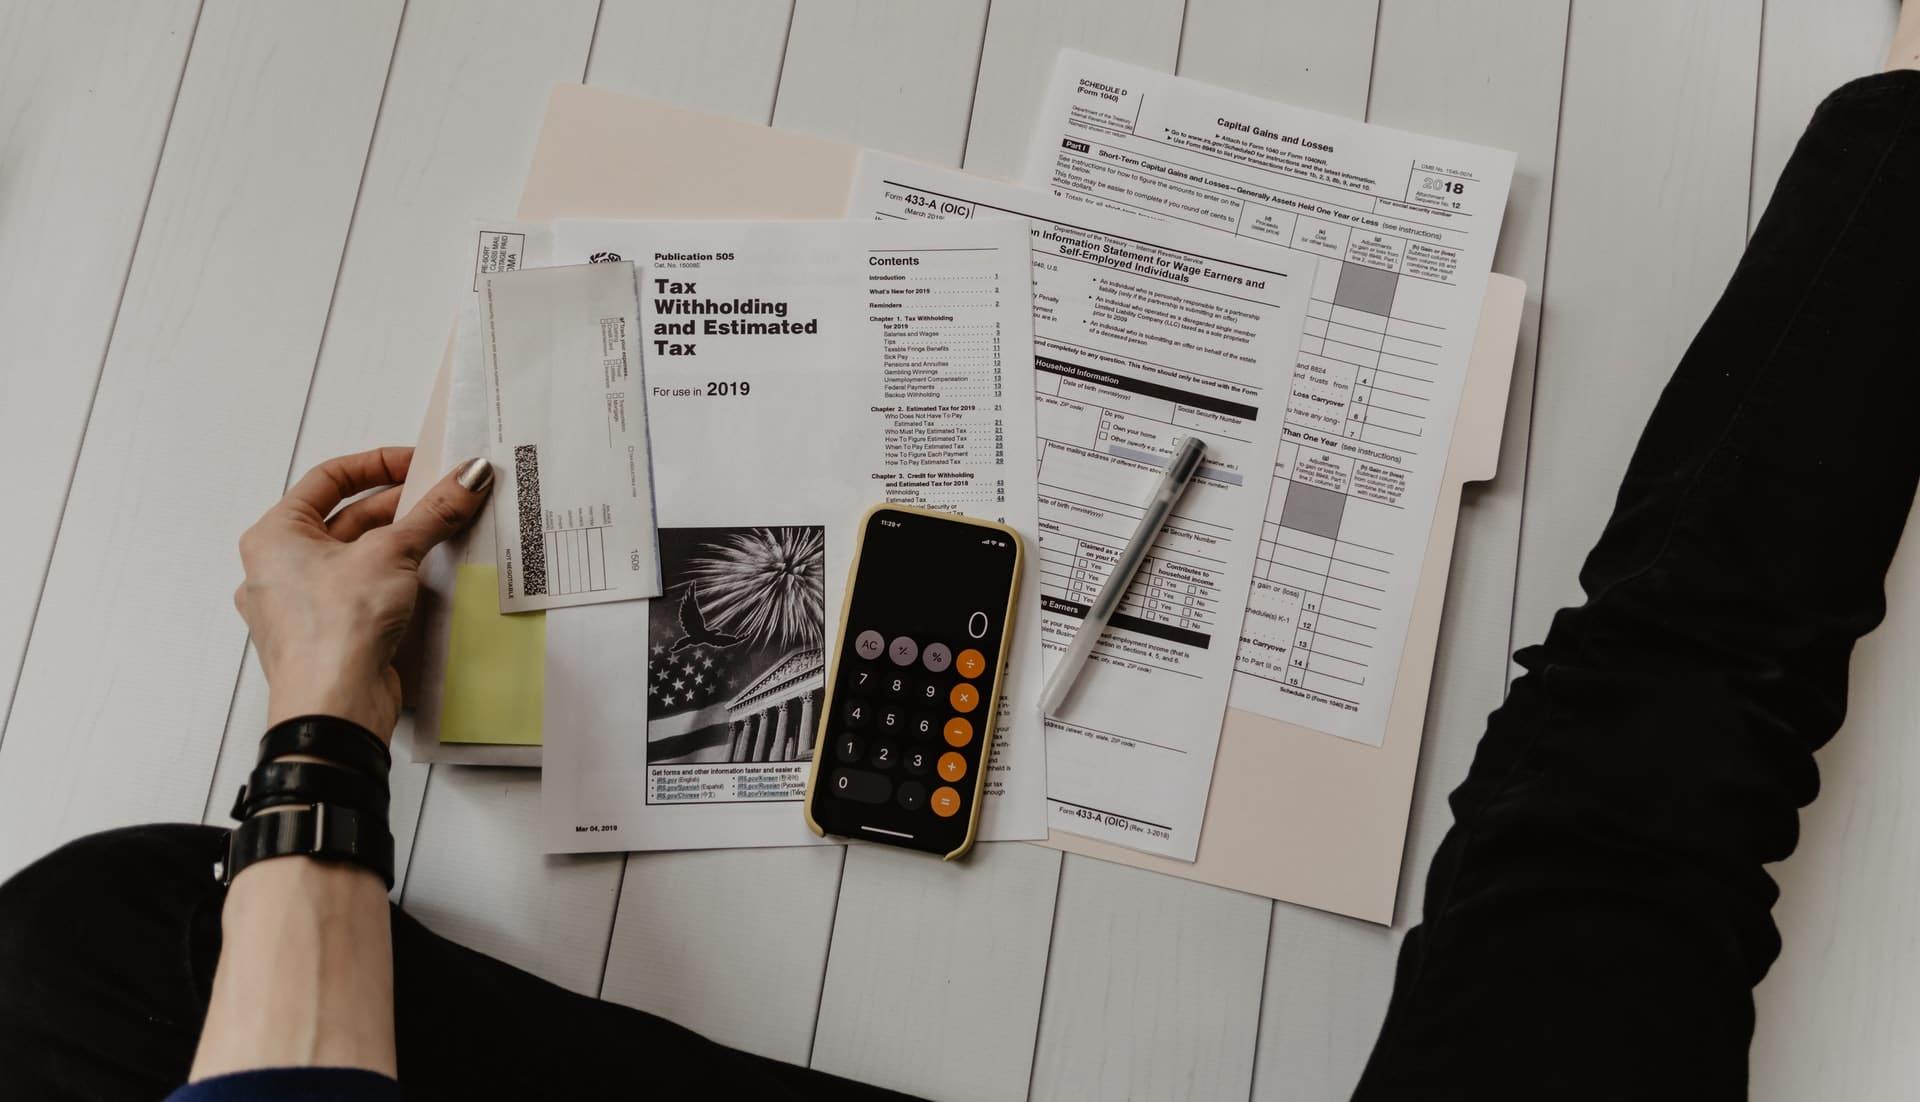 ING Diba Kontoführungsgebühren